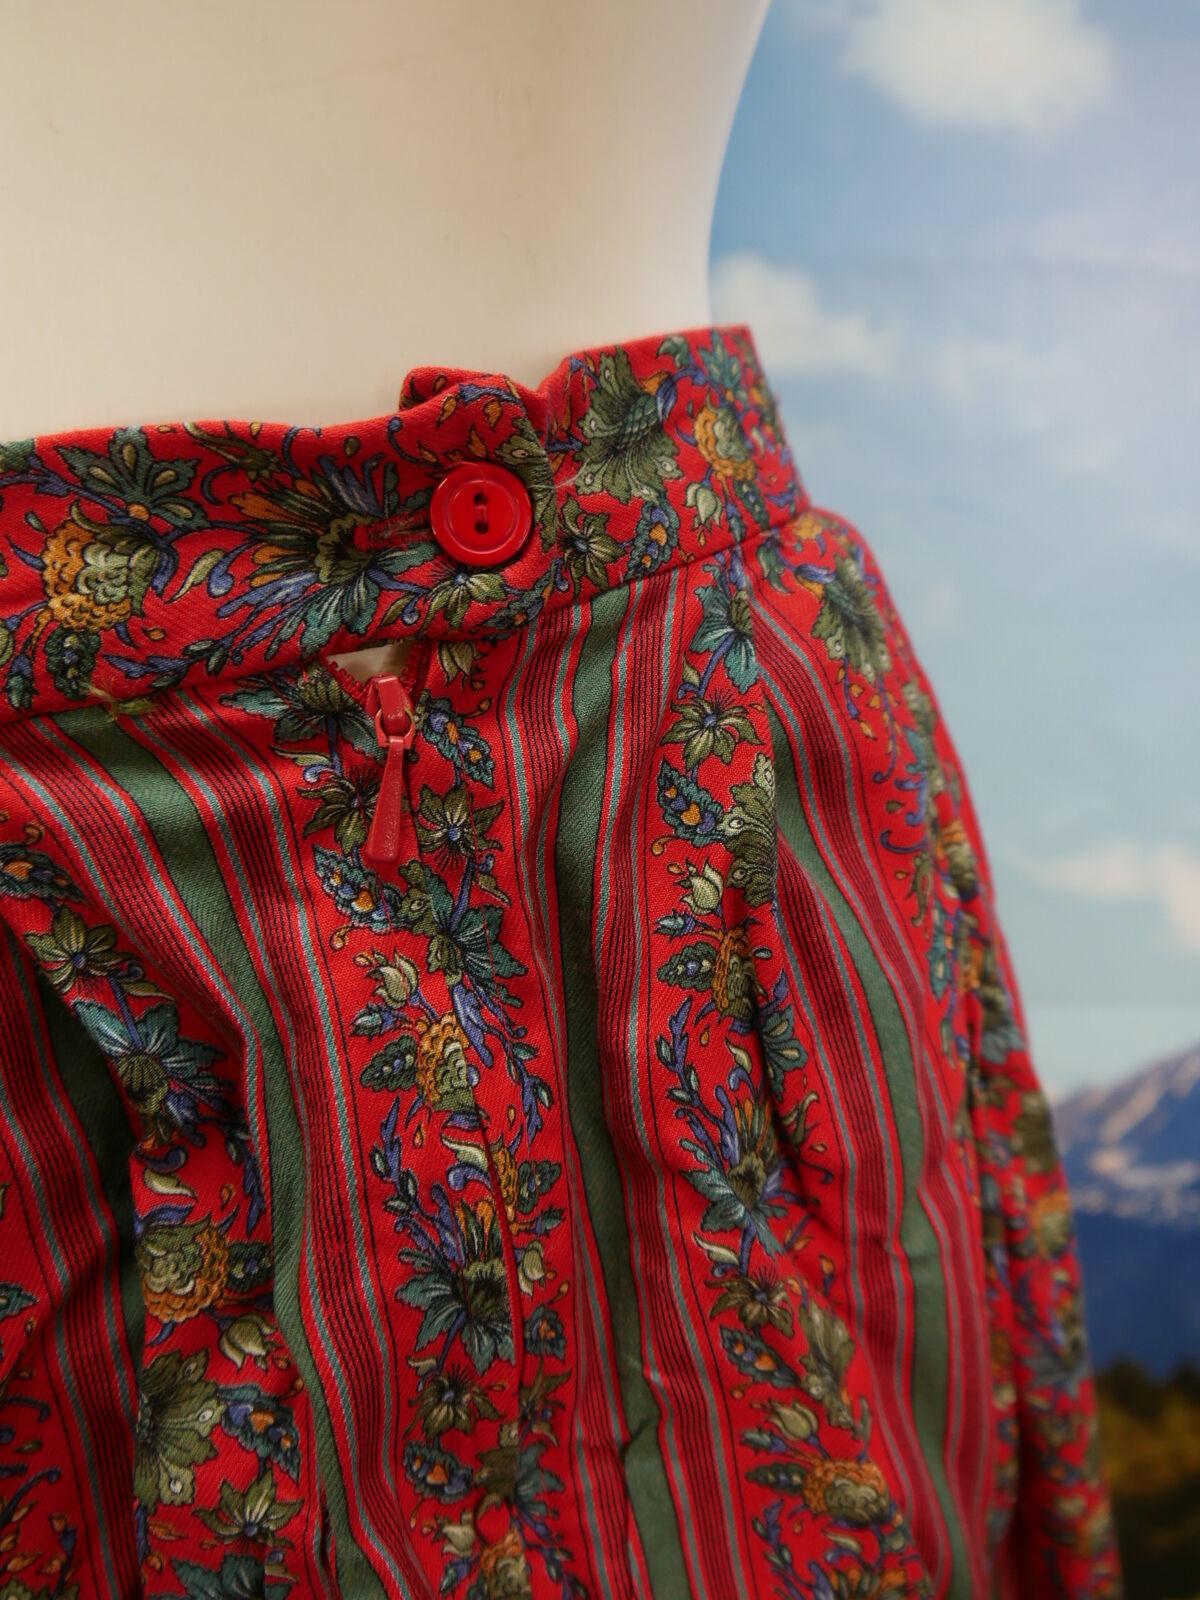 Trachten Rock Meico Rosso Cotone Motivo Floreale magnifico fantastiche Trachten Trachten Trachten ROCK TG. 38 e46176